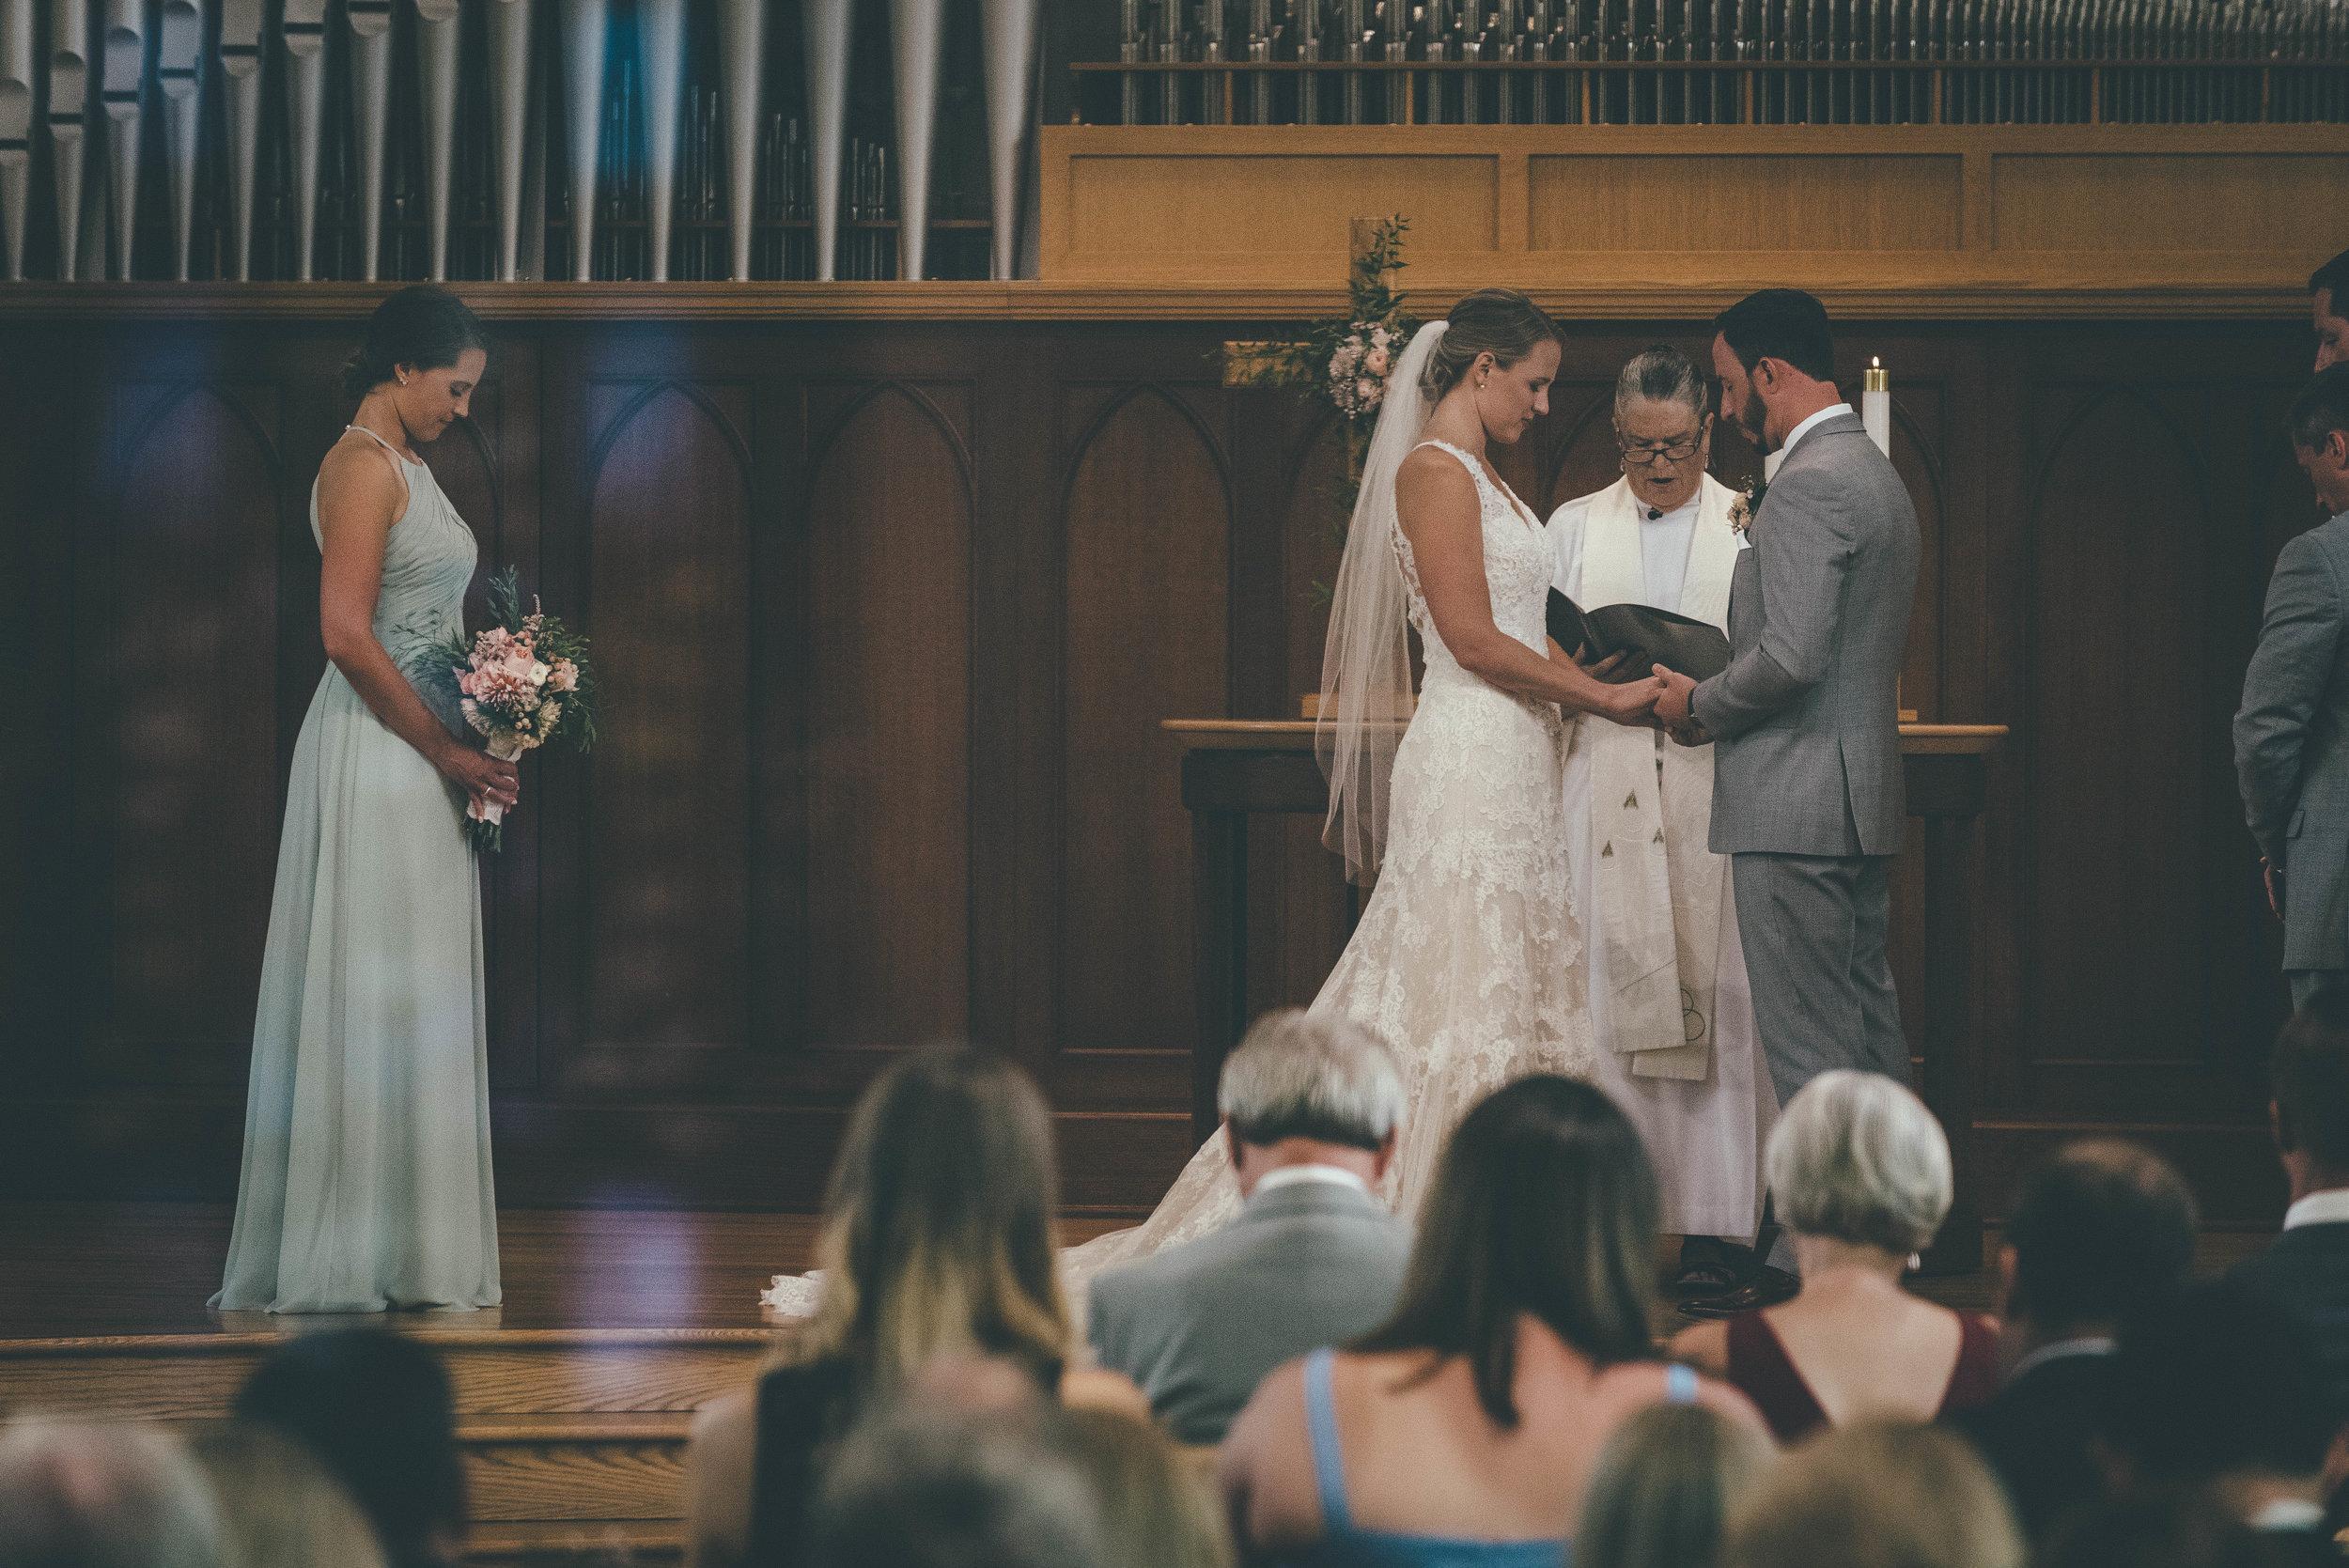 ChadFahnestockPhotography-mc-wedding-013.jpg